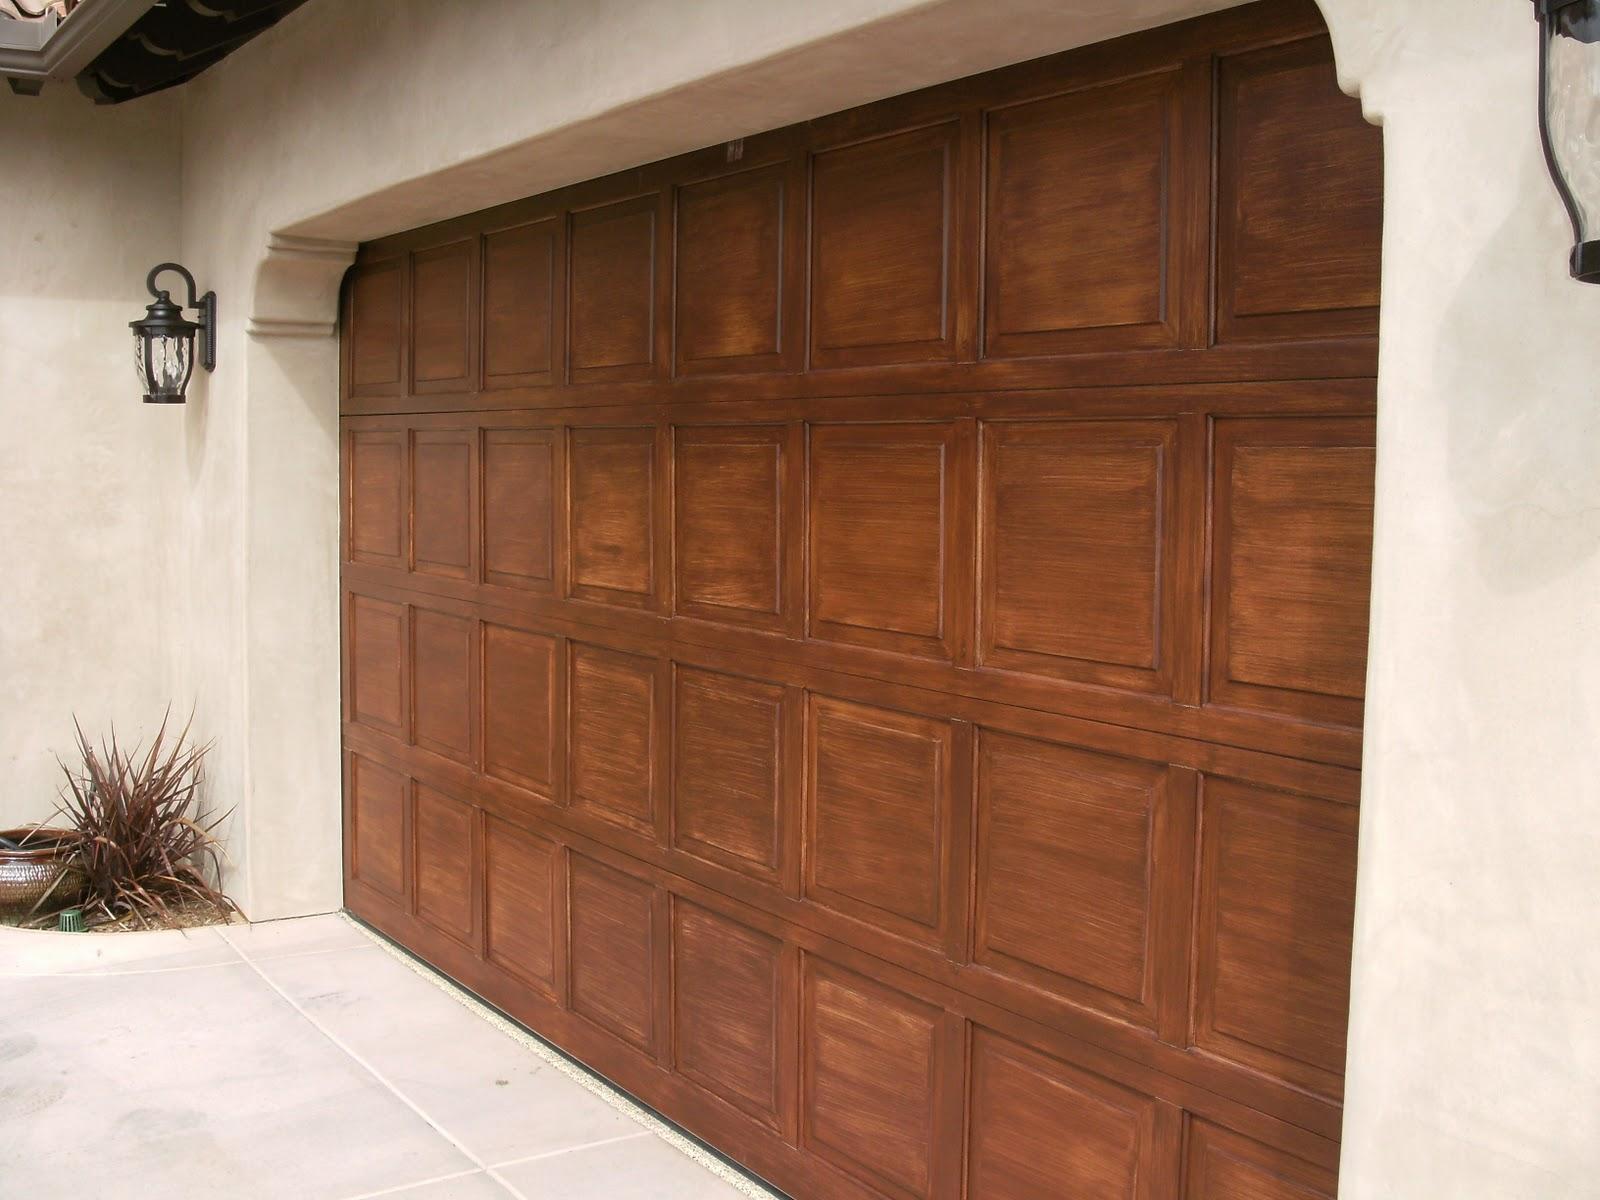 Fiberglass garage doors that look like wood fancy home design for Garage doors that look like wood